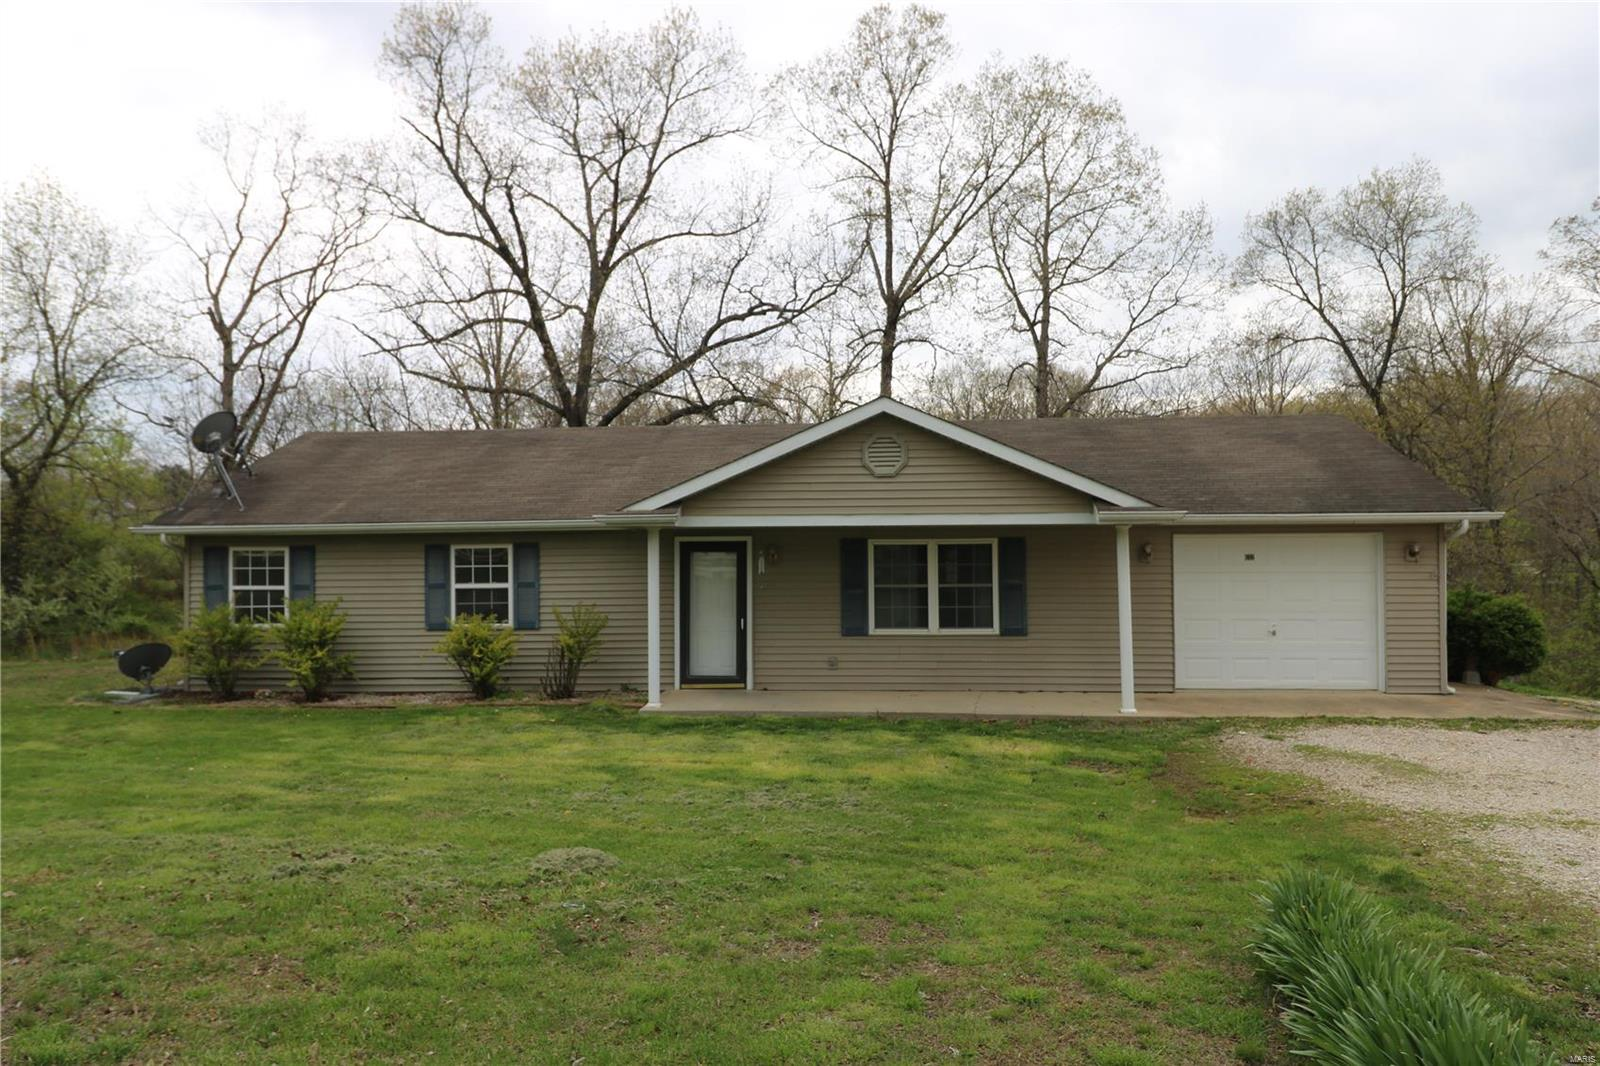 632 Ransom Property Photo - Leasburg, MO real estate listing